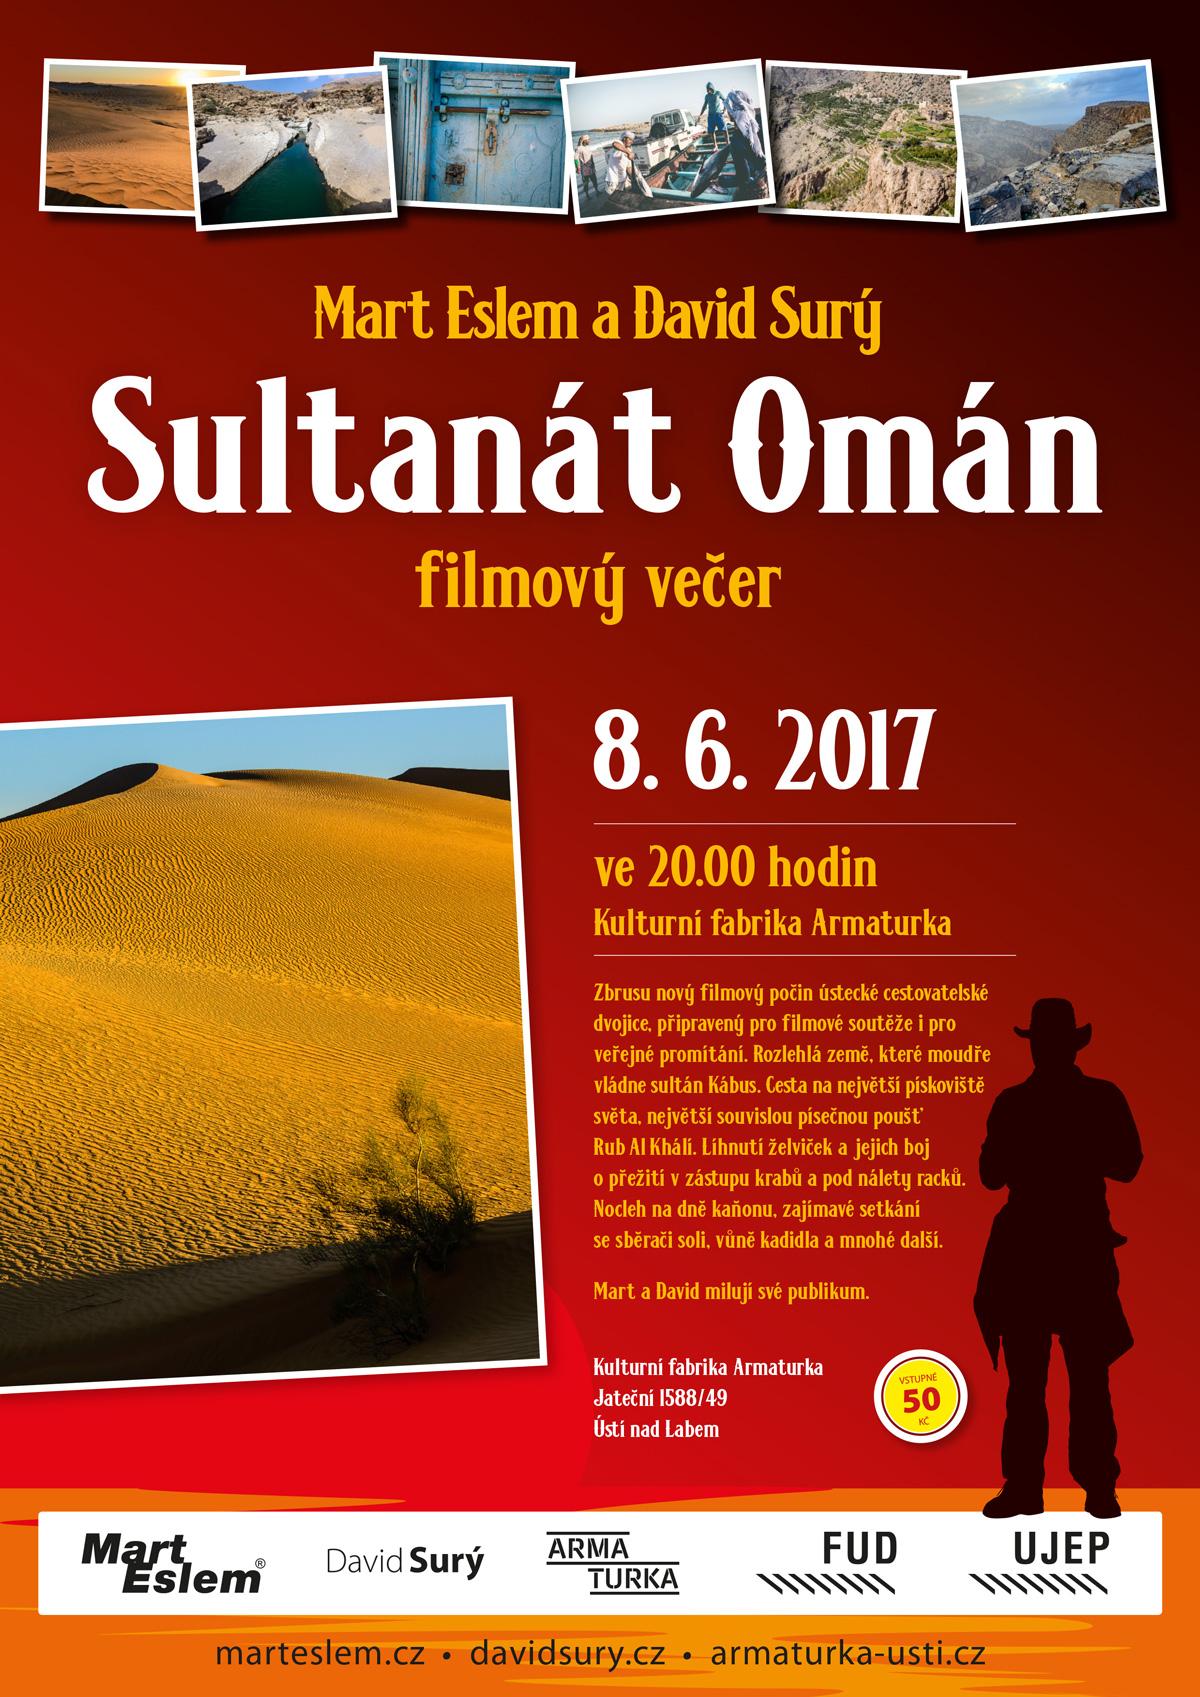 Sultanát Omán FILM David Surý Mart Eslem